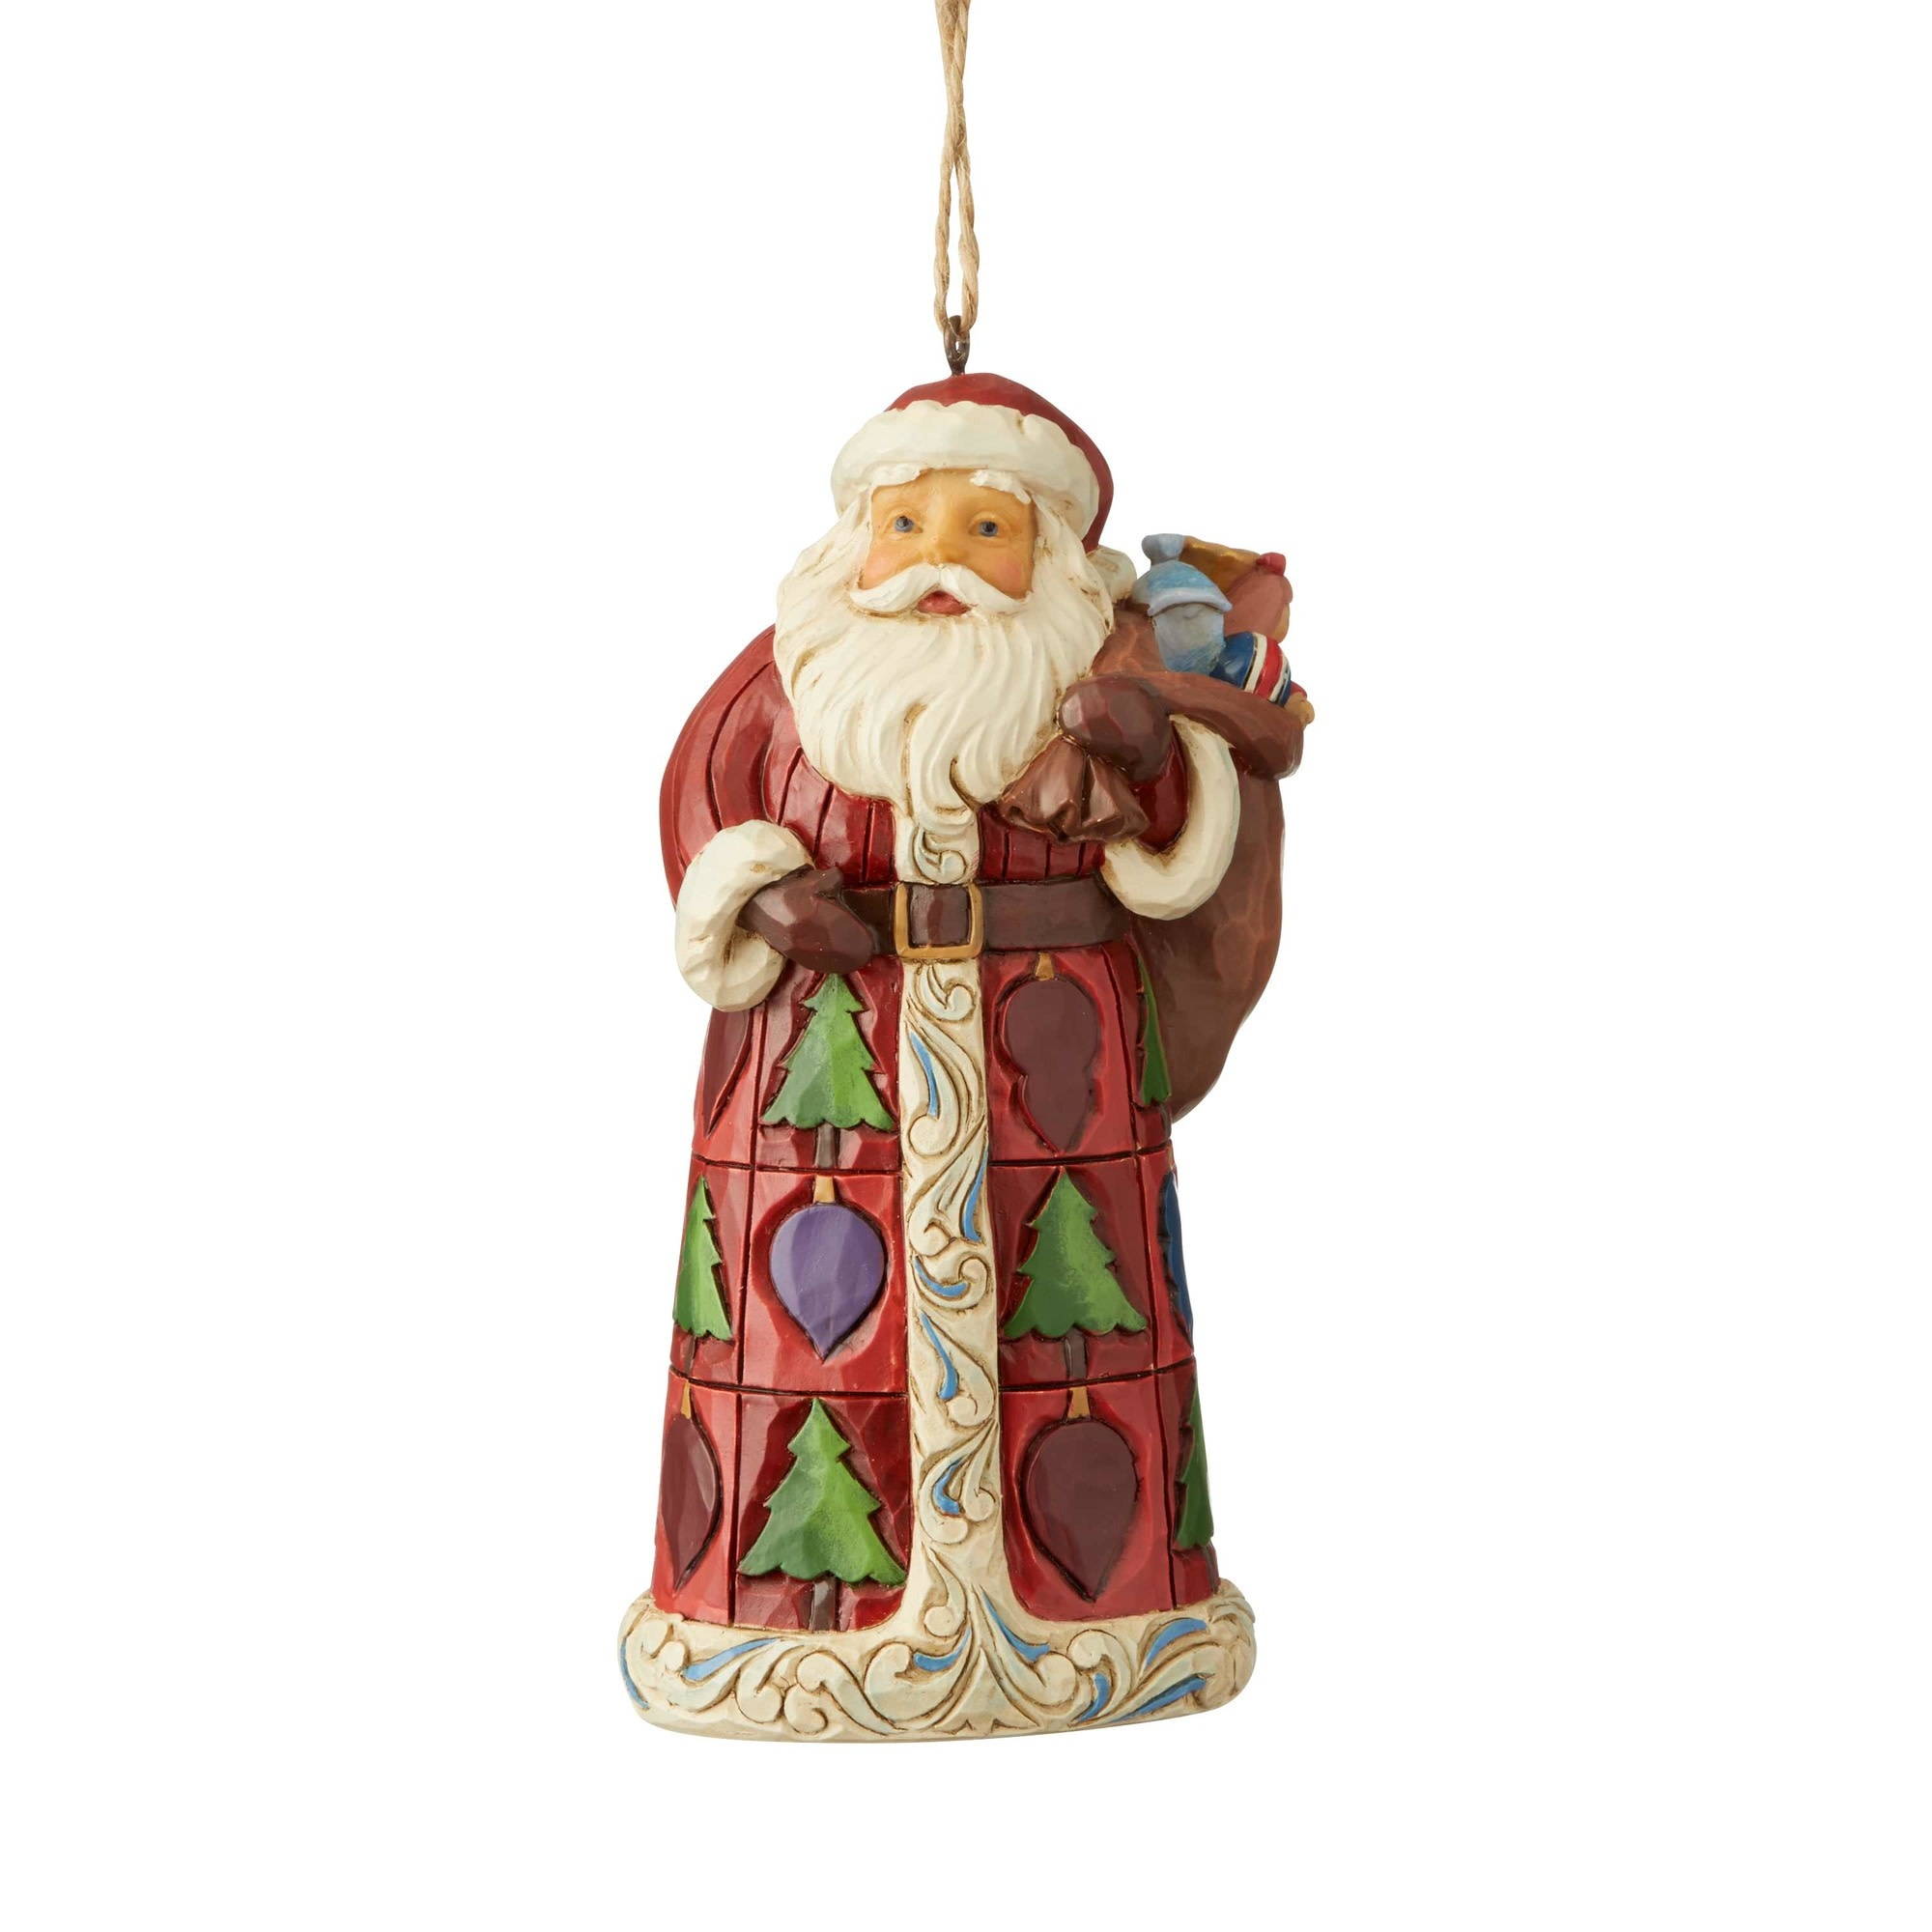 Jim Shore Santa with Toy Bag Ornament